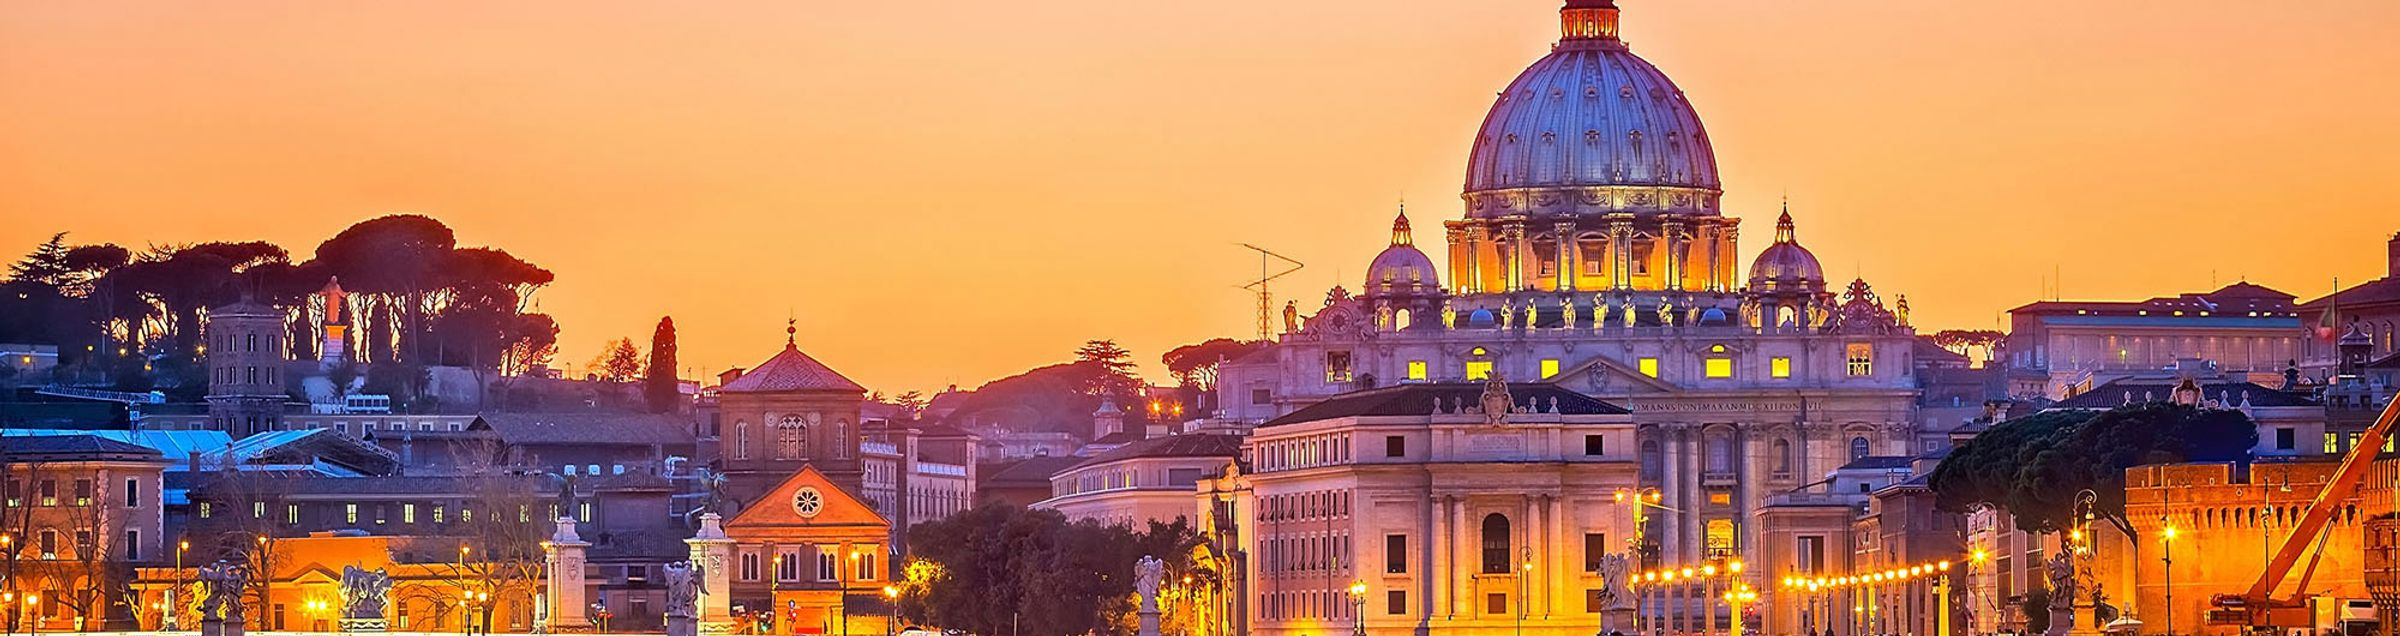 Hotel Roma - Offerte b&b e alberghi da € 106 | Skyscanner